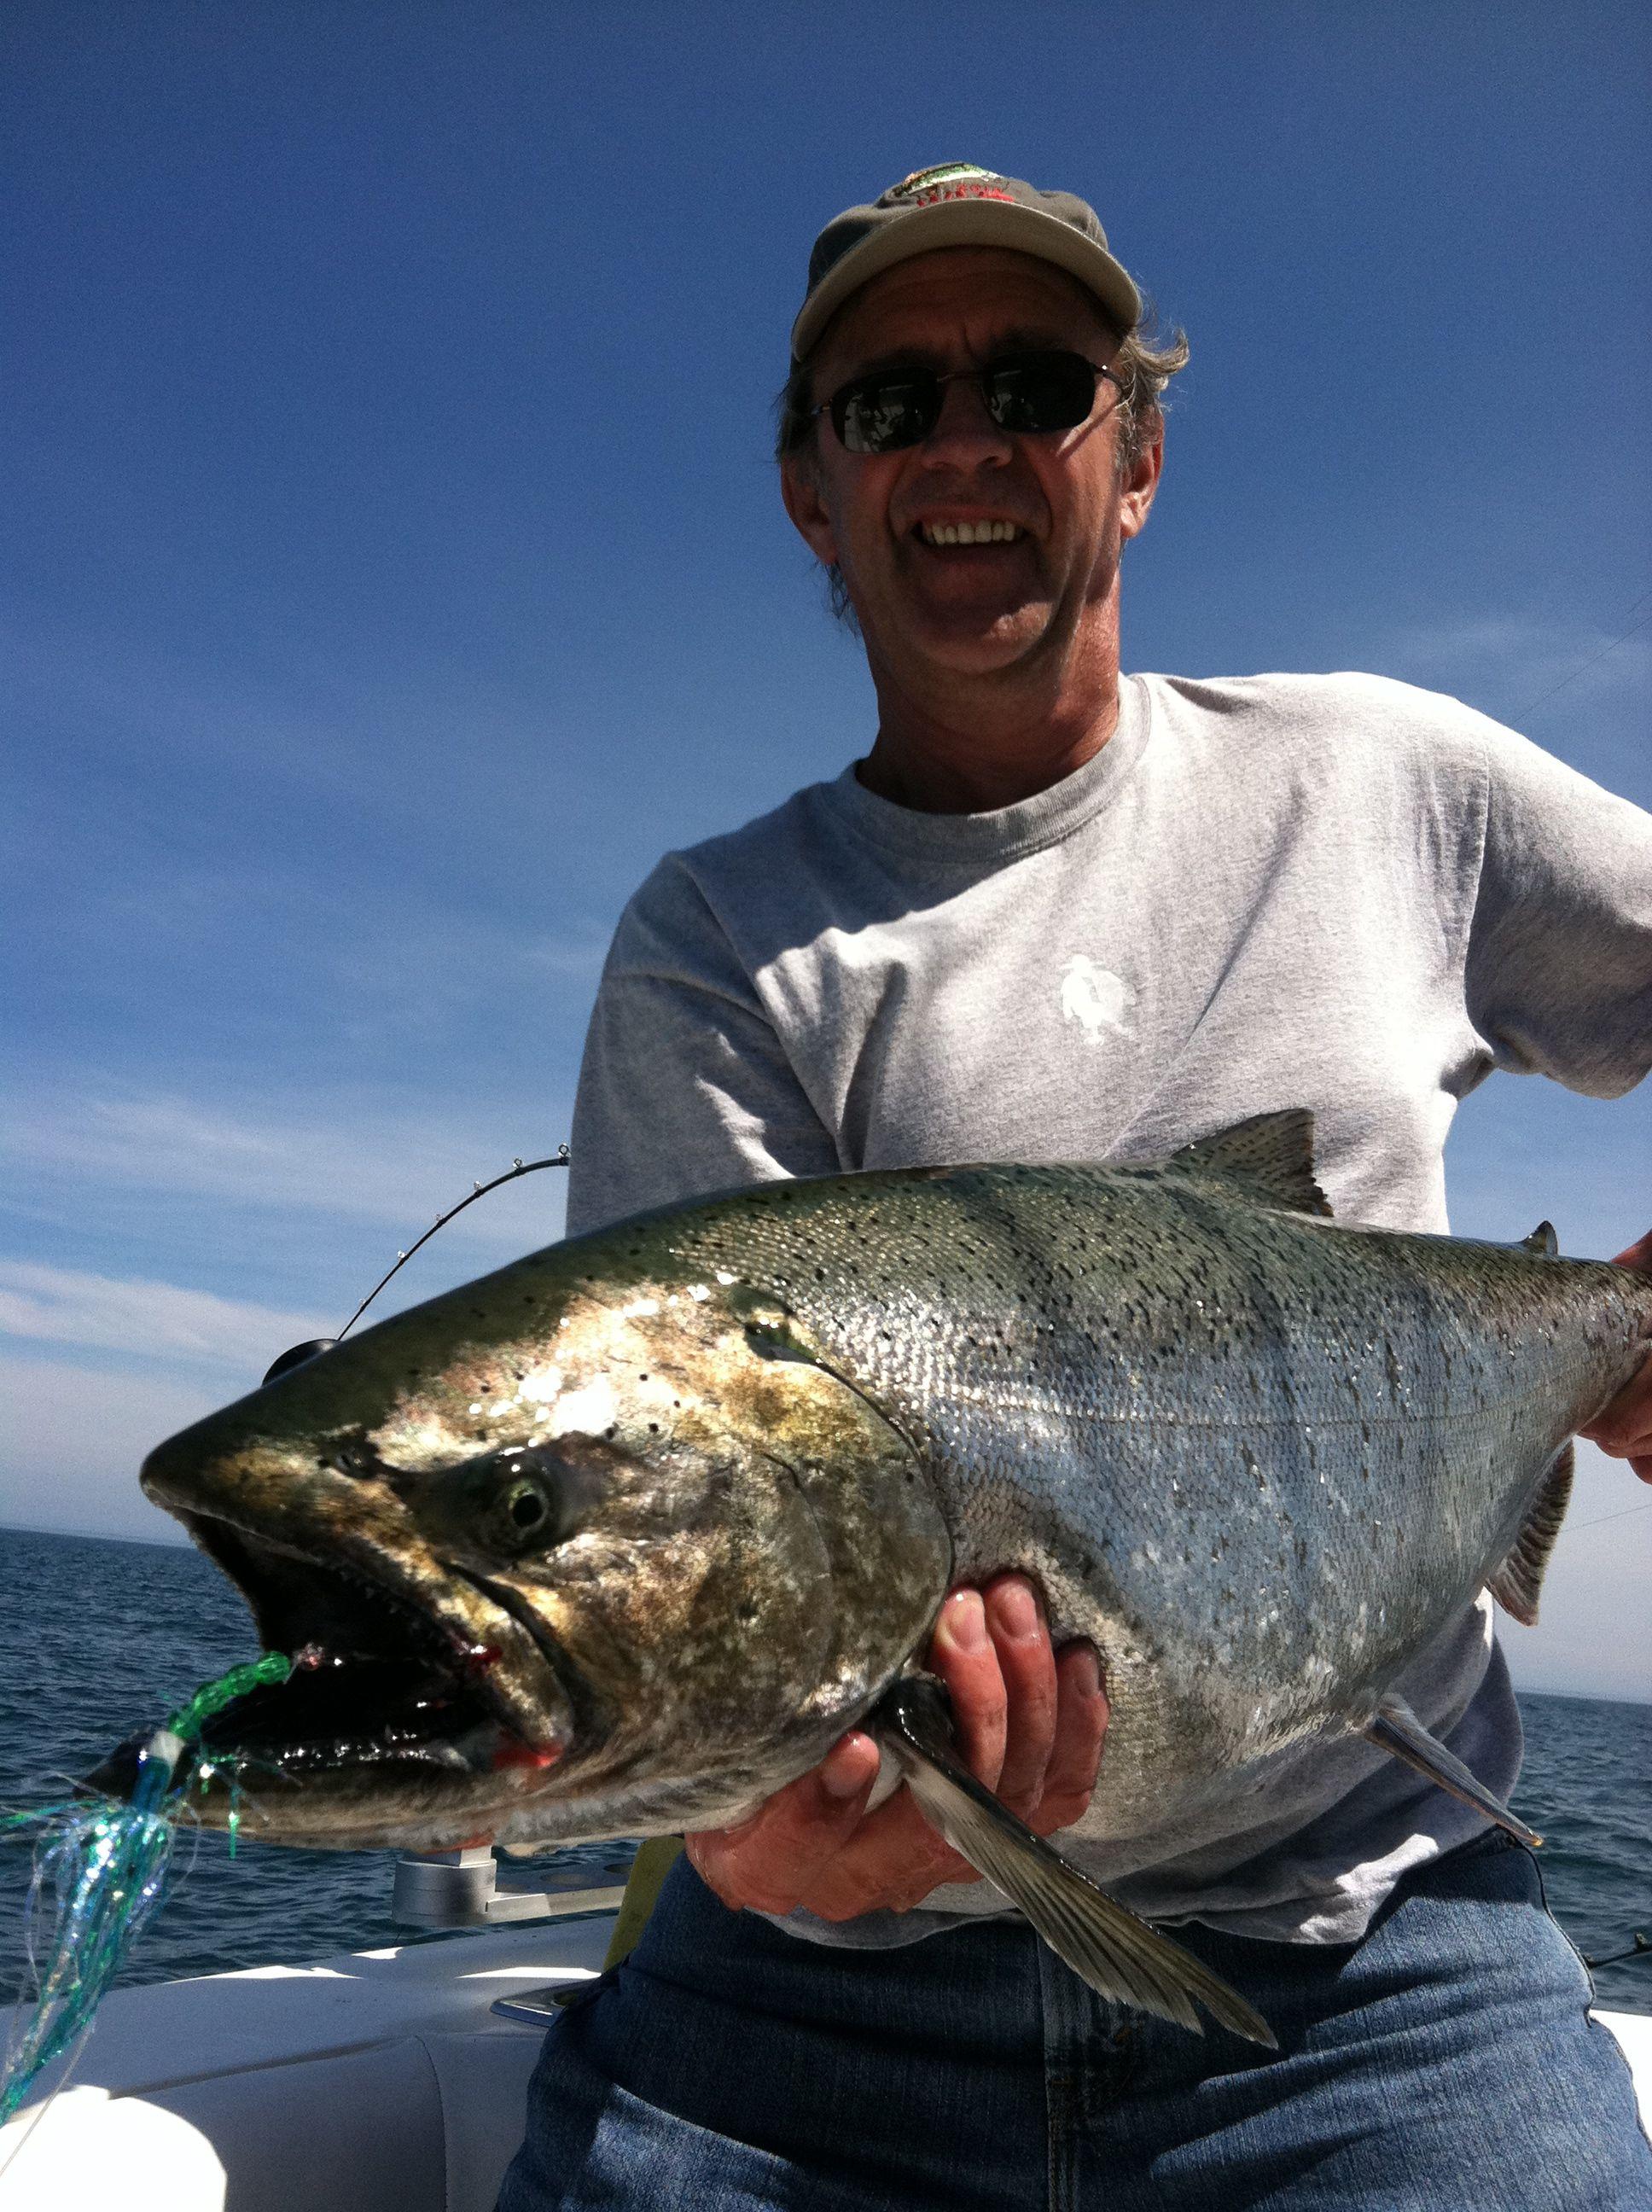 Lake michigan charter fishing wisconsin algoma rv for Lake michigan fishing charters wisconsin